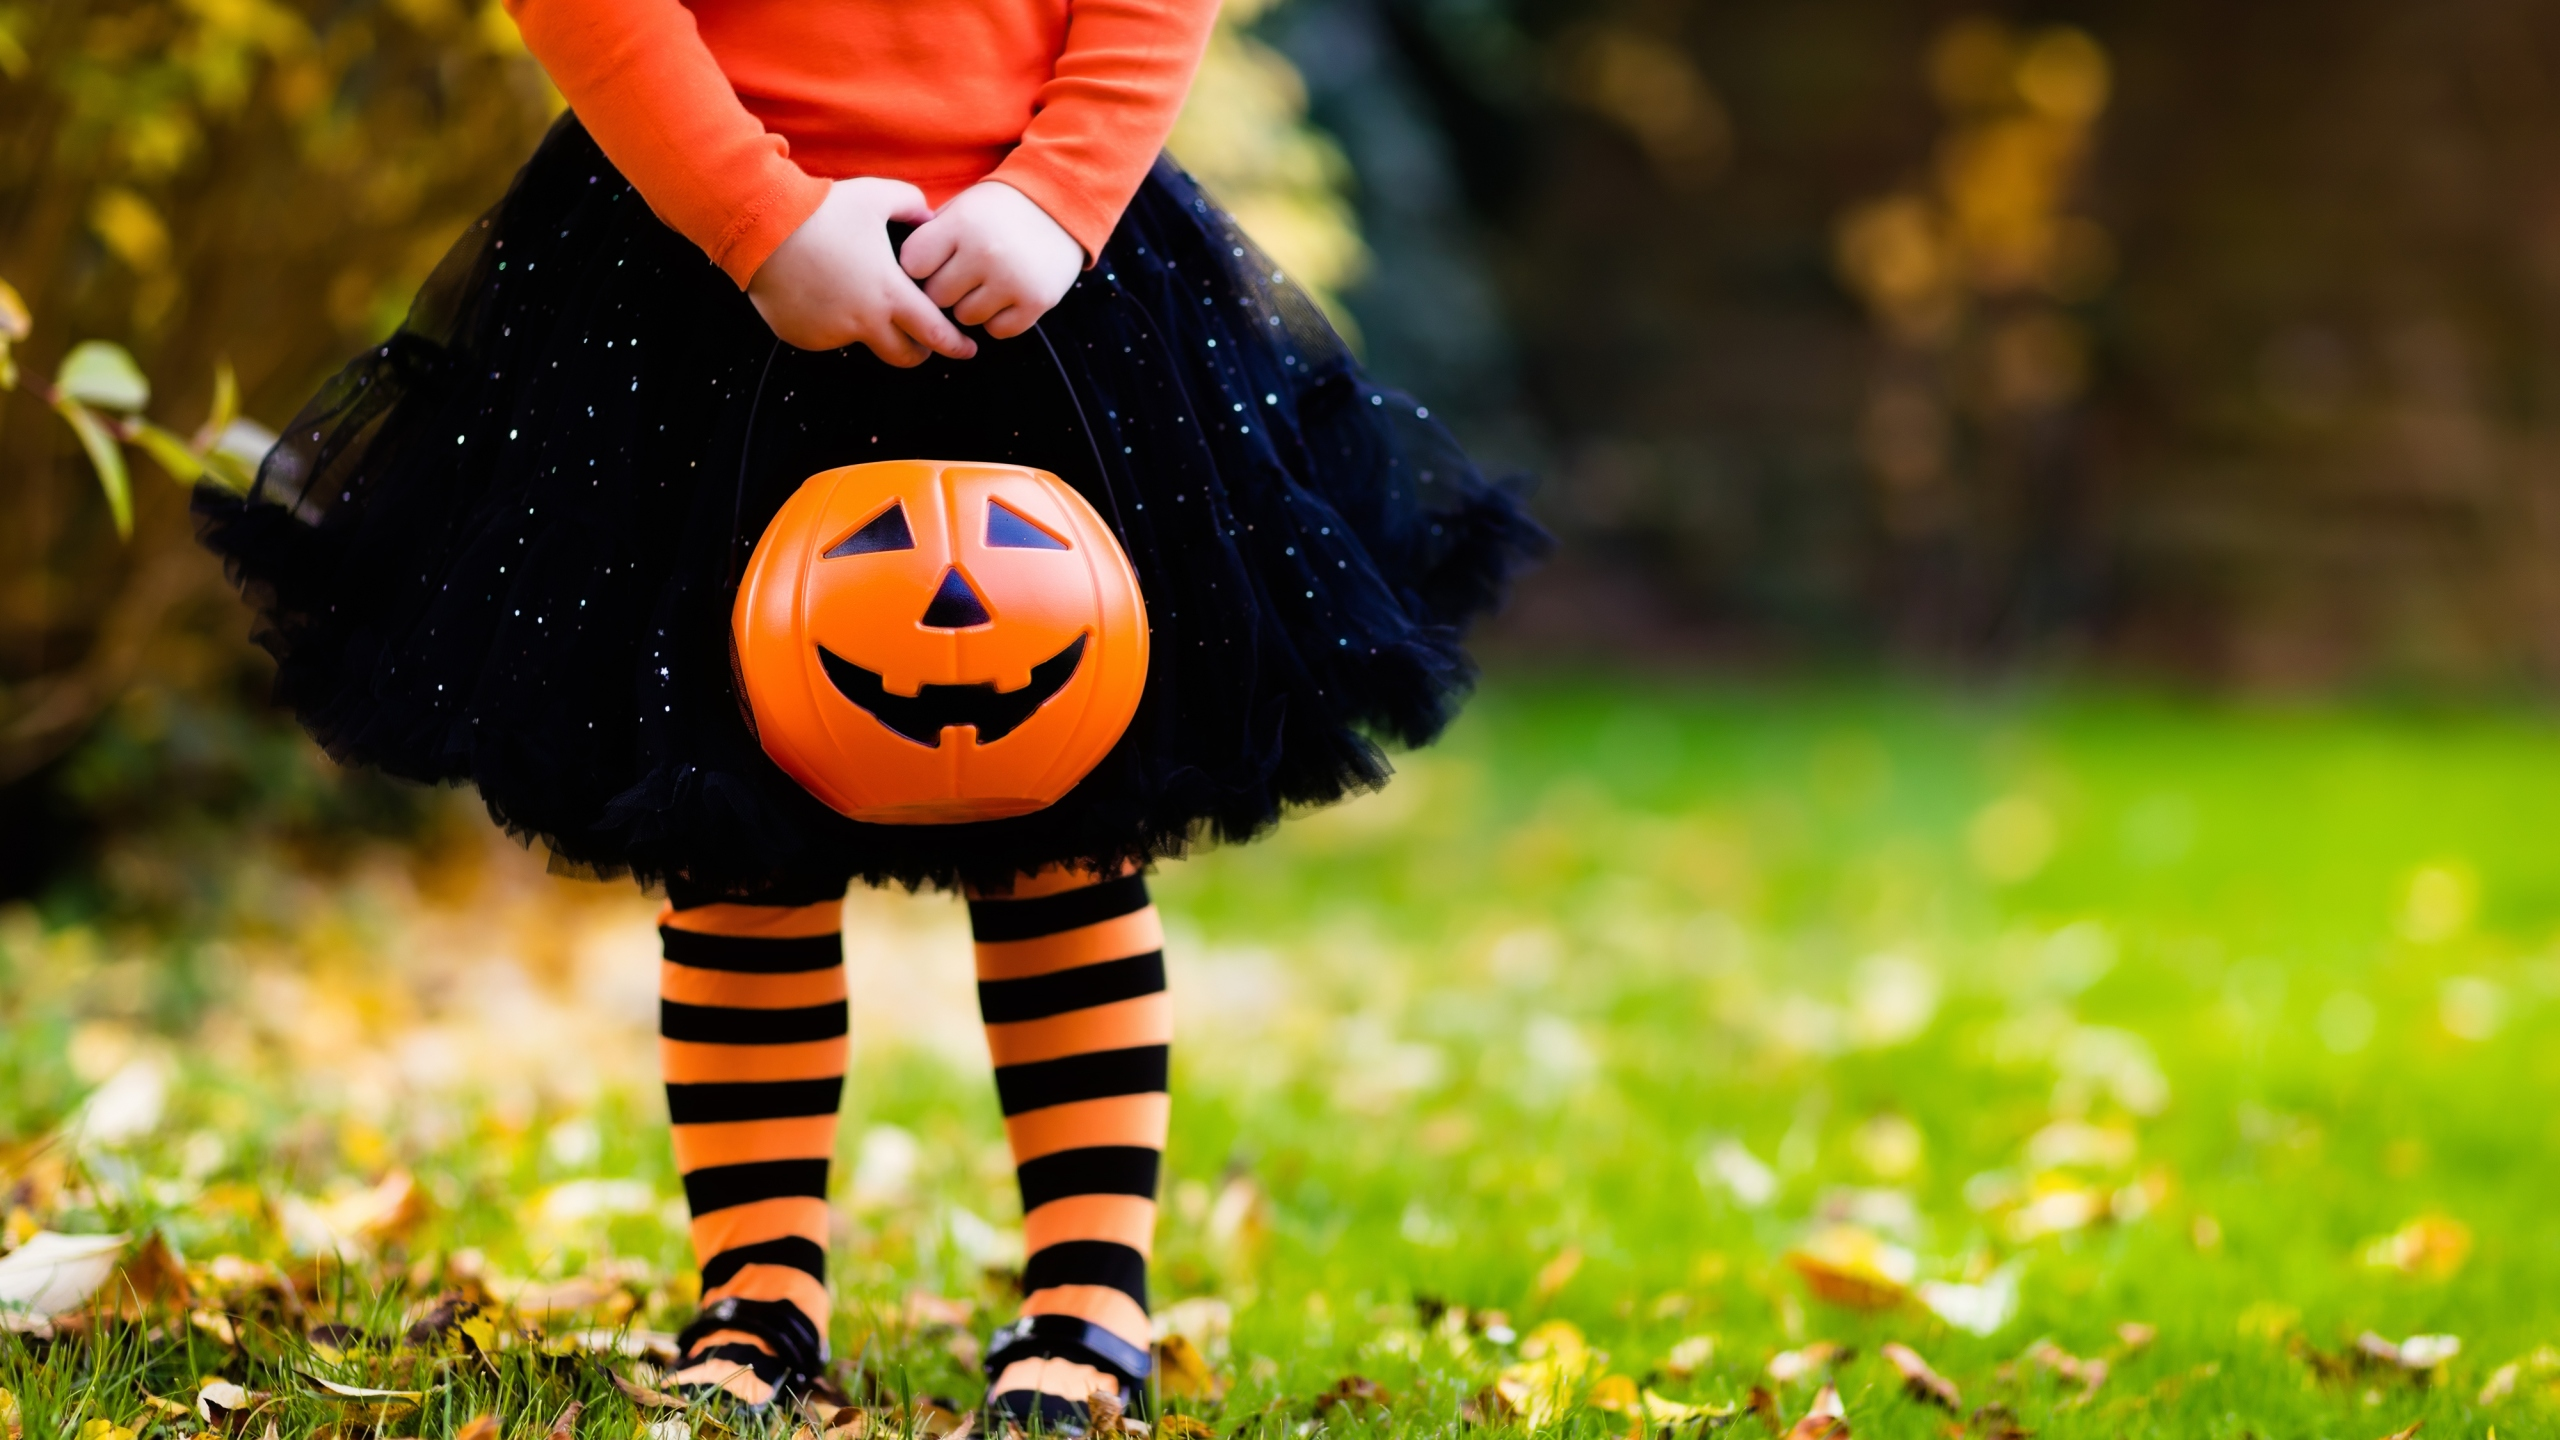 Gulf Coast Halloween 2020 WKRG | Halloween events around the Gulf Coast